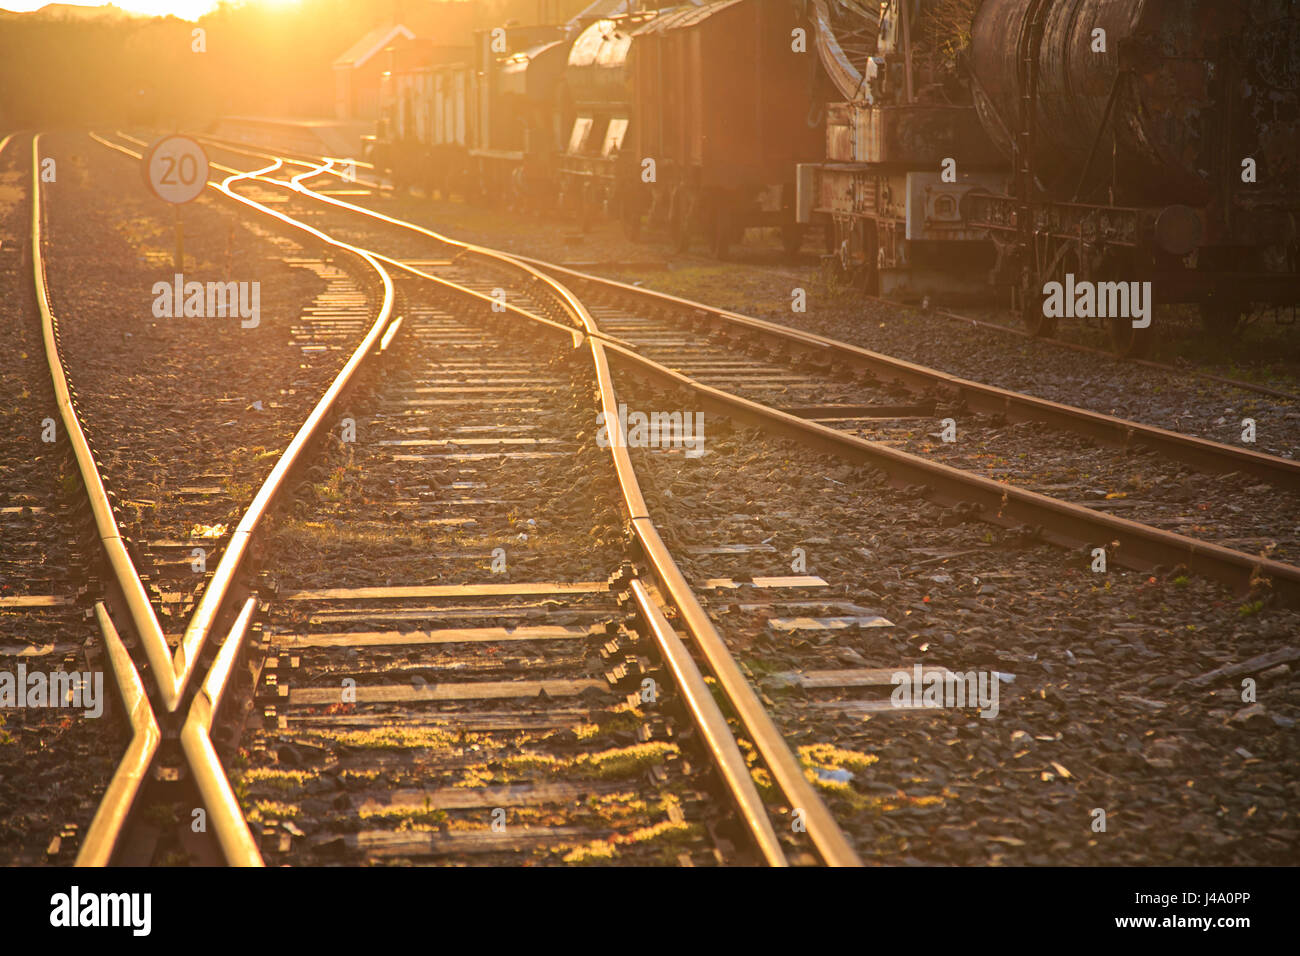 Twisting railway tracks as the sun sets - Stock Image